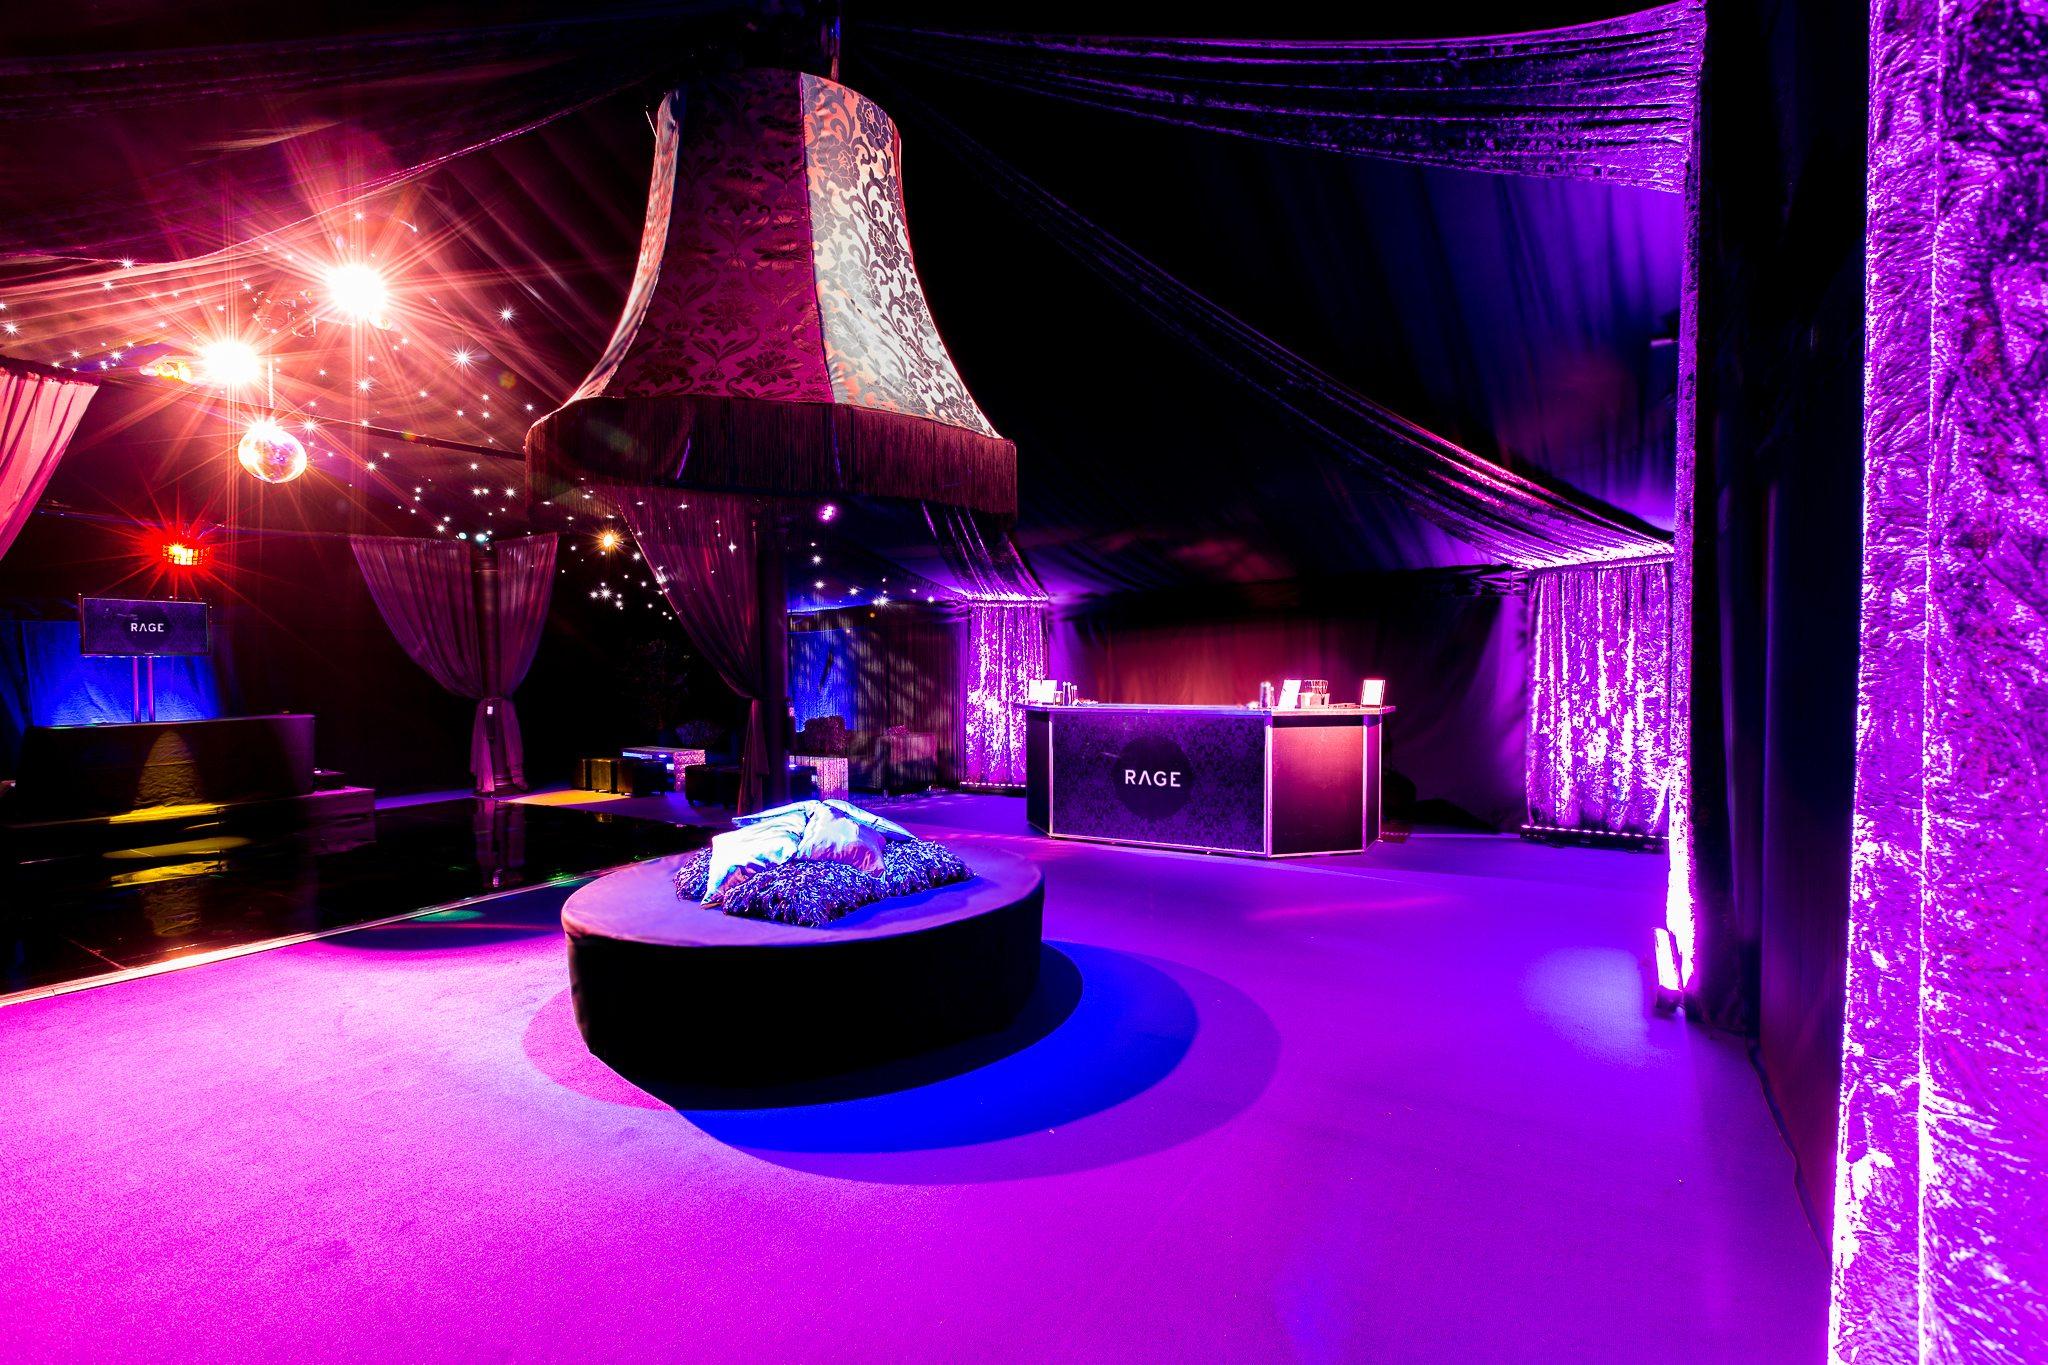 The Rage Luxury Vip Pop Up Nightclub Mirage Parties